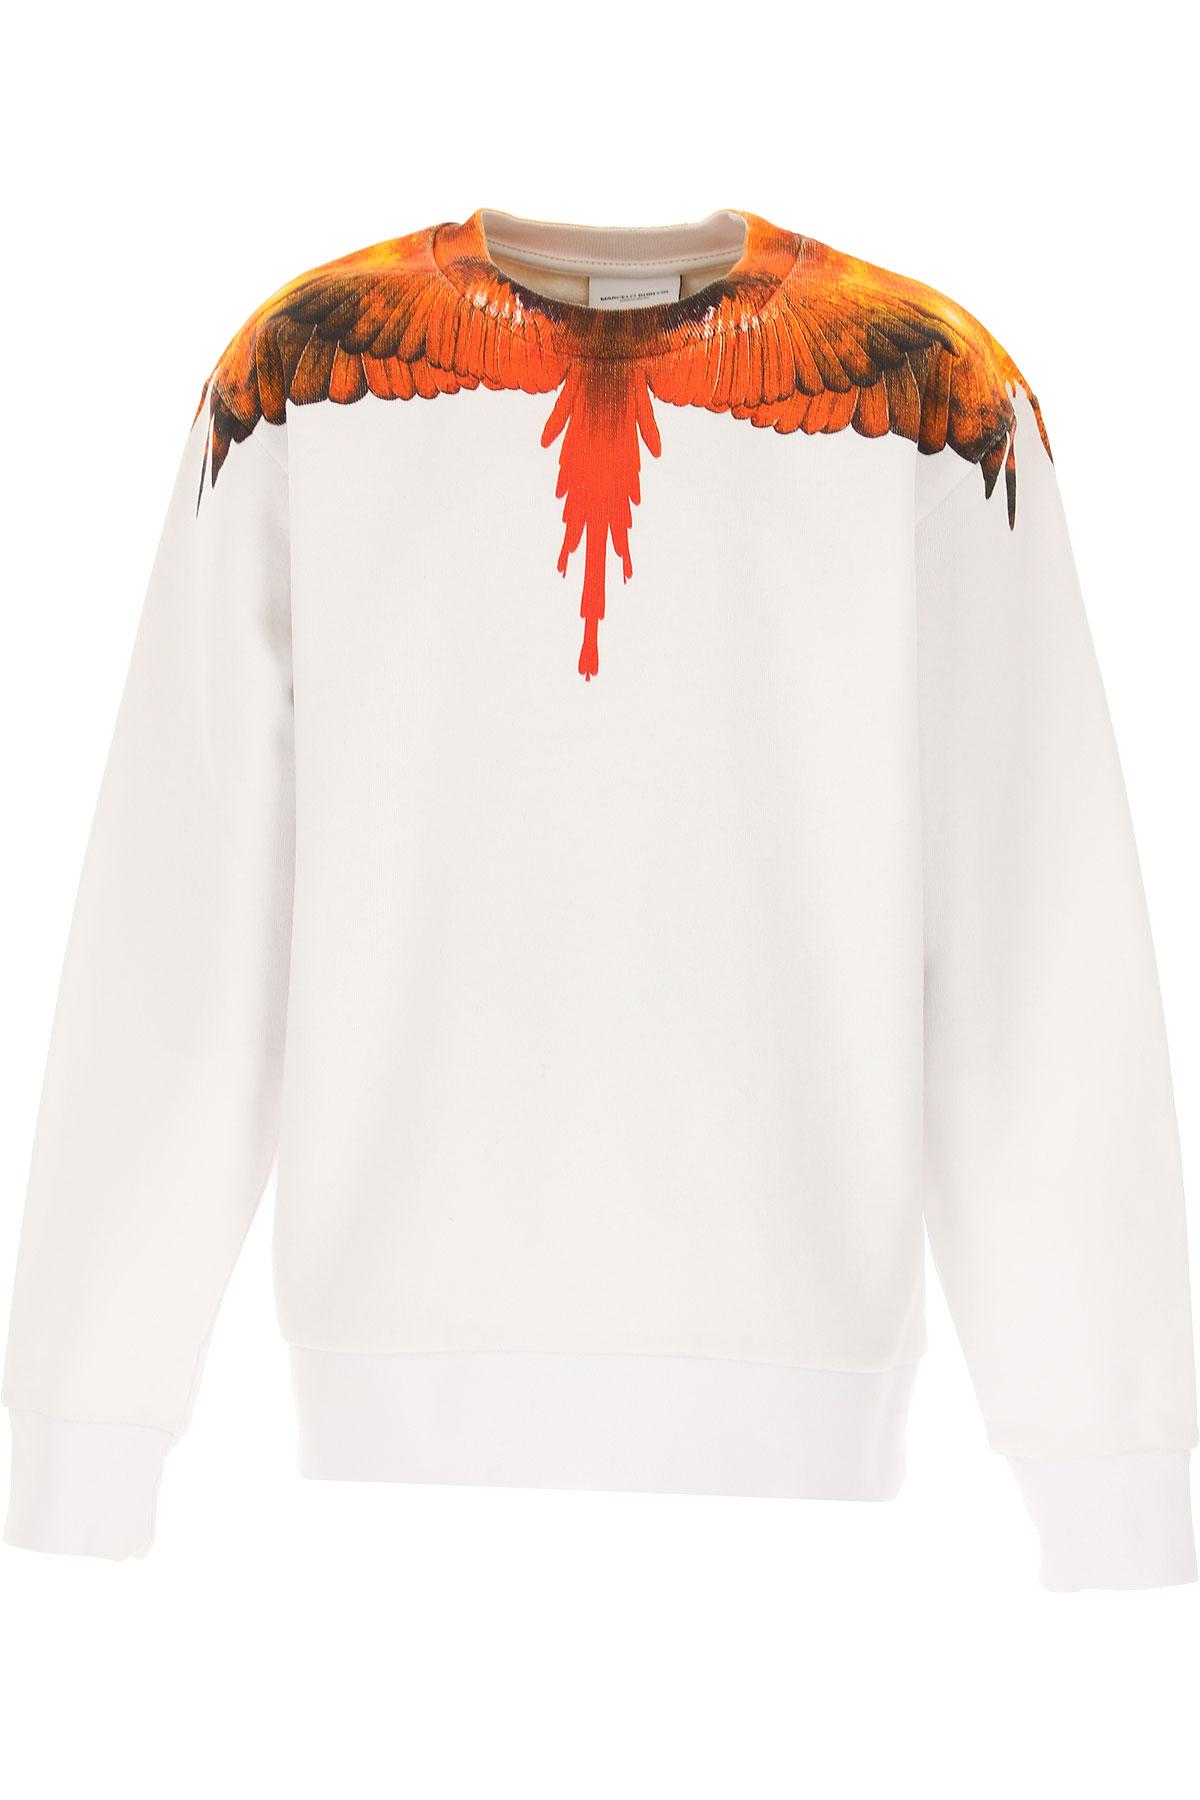 Marcelo Burlon Kids Sweatshirts & Hoodies for Boys On Sale, White, Cotton, 2019, 10Y 6Y 8Y